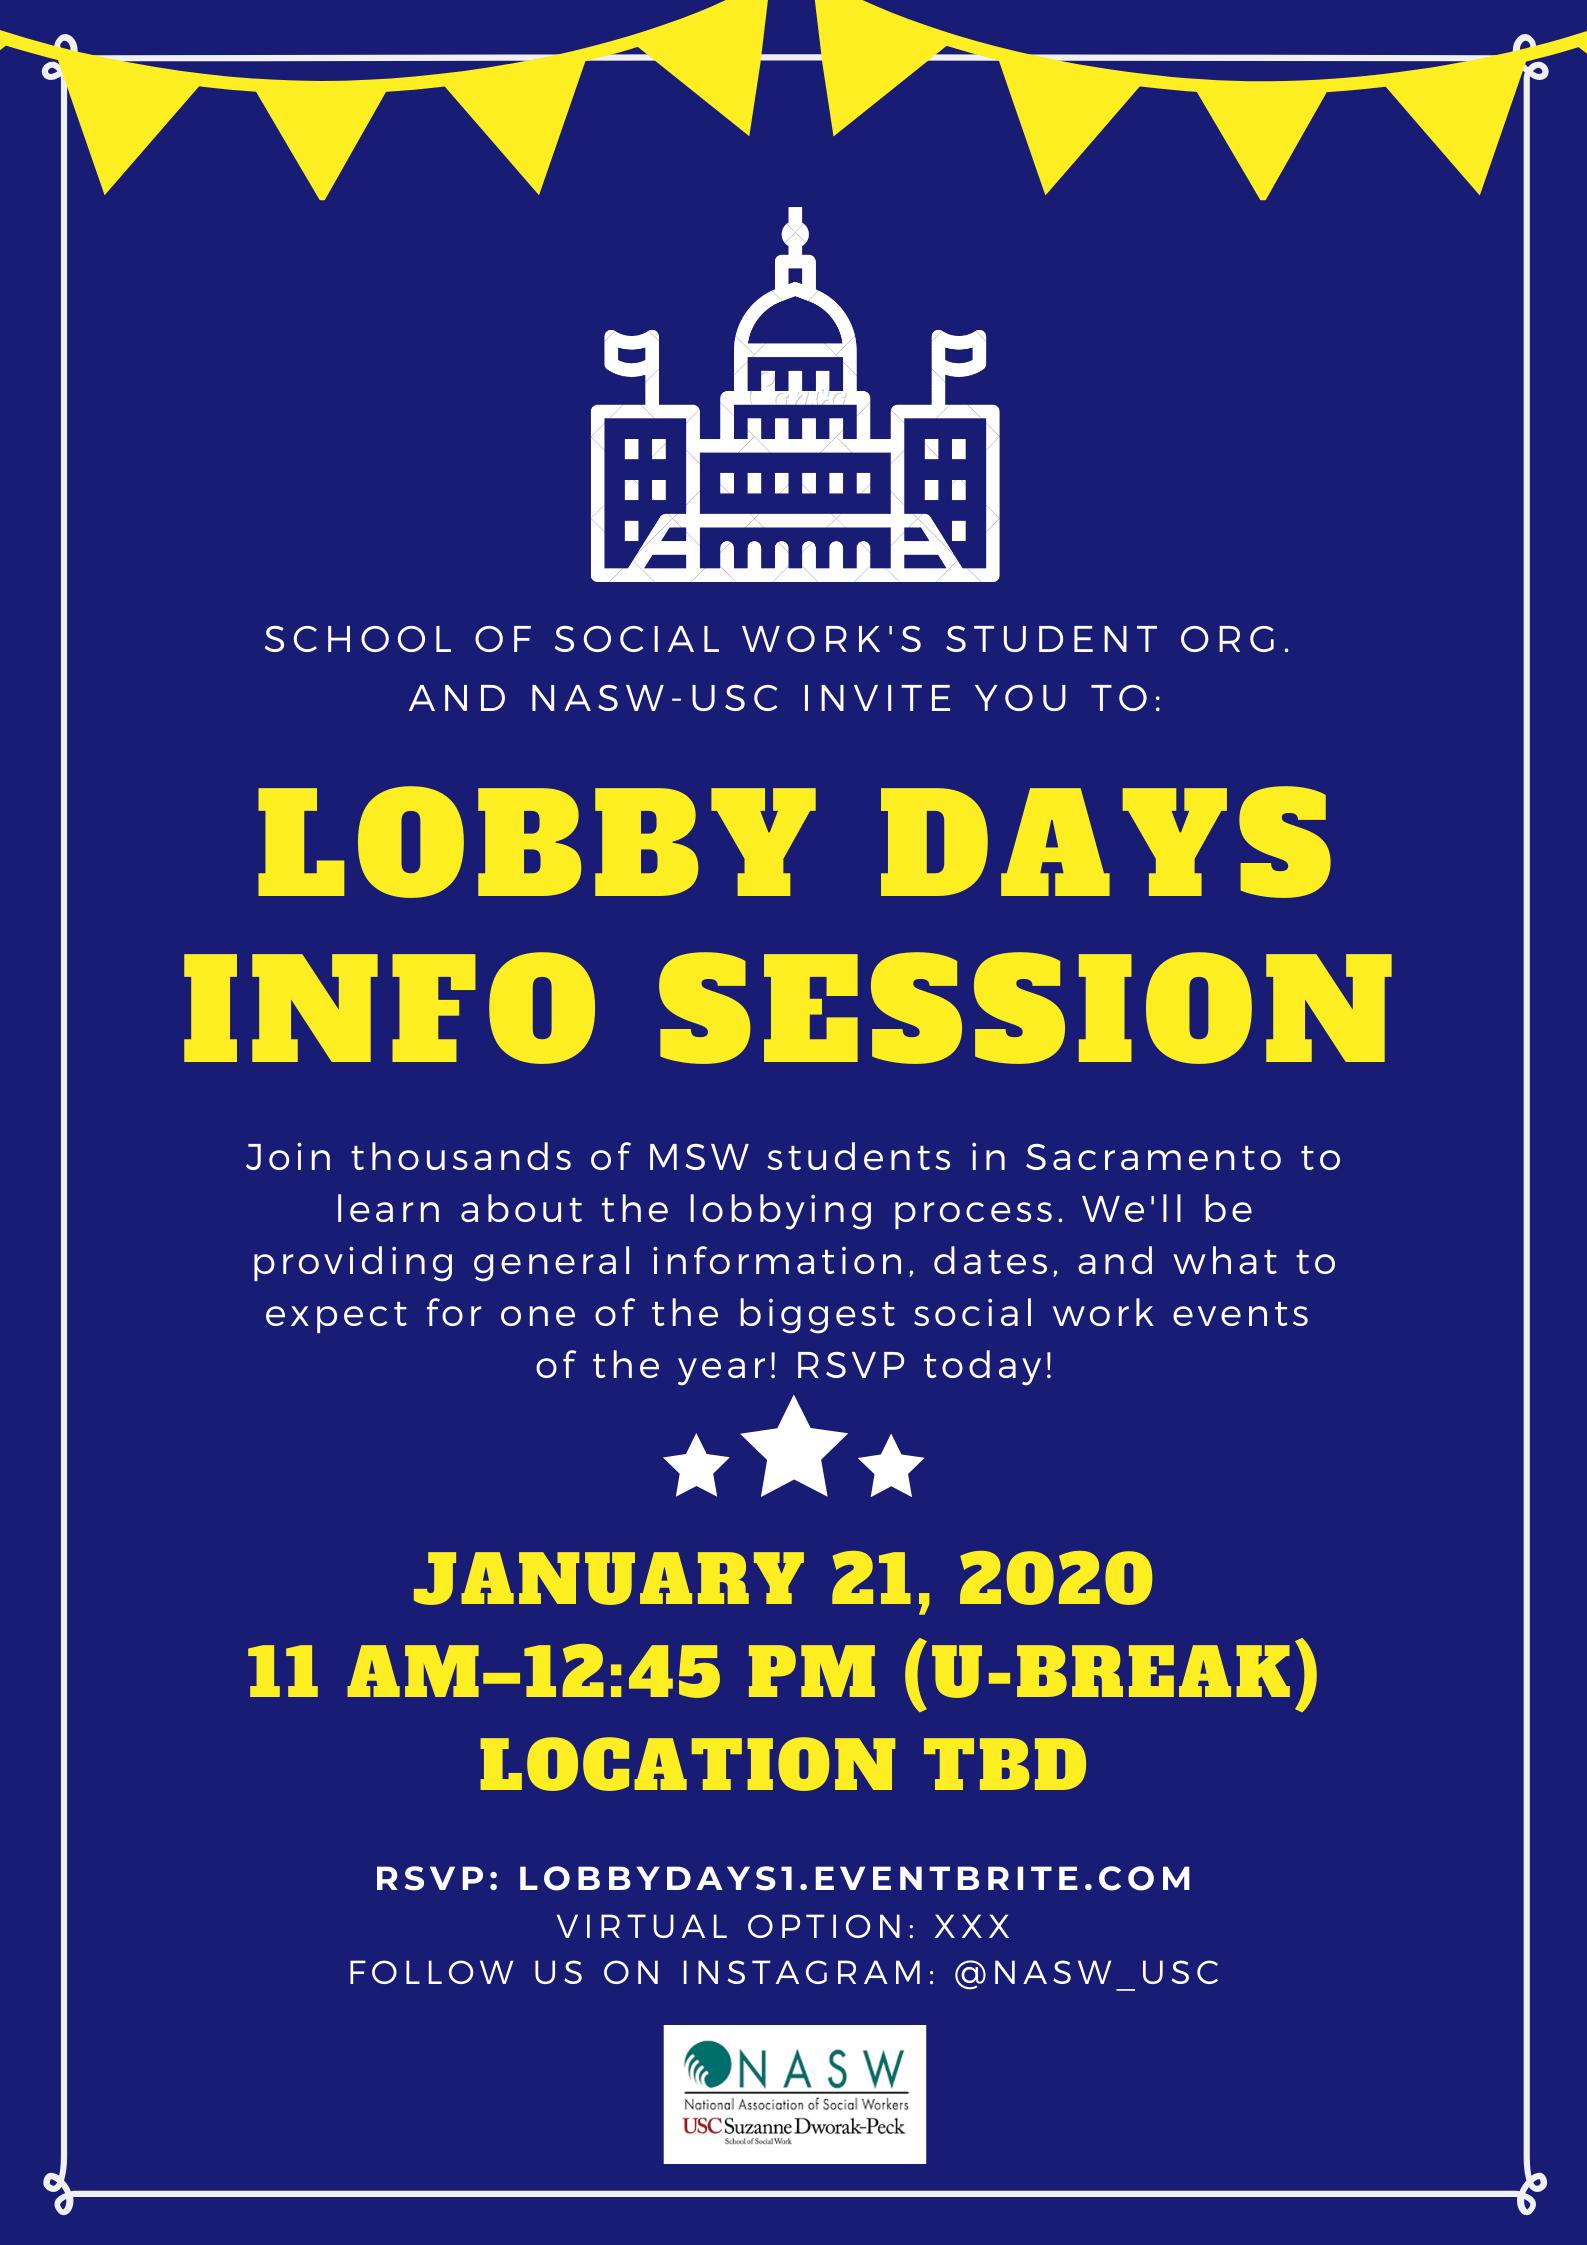 Usc Fall Semester 2020.Lobby Days Info Session 1 Registration Tue Jan 21 2020